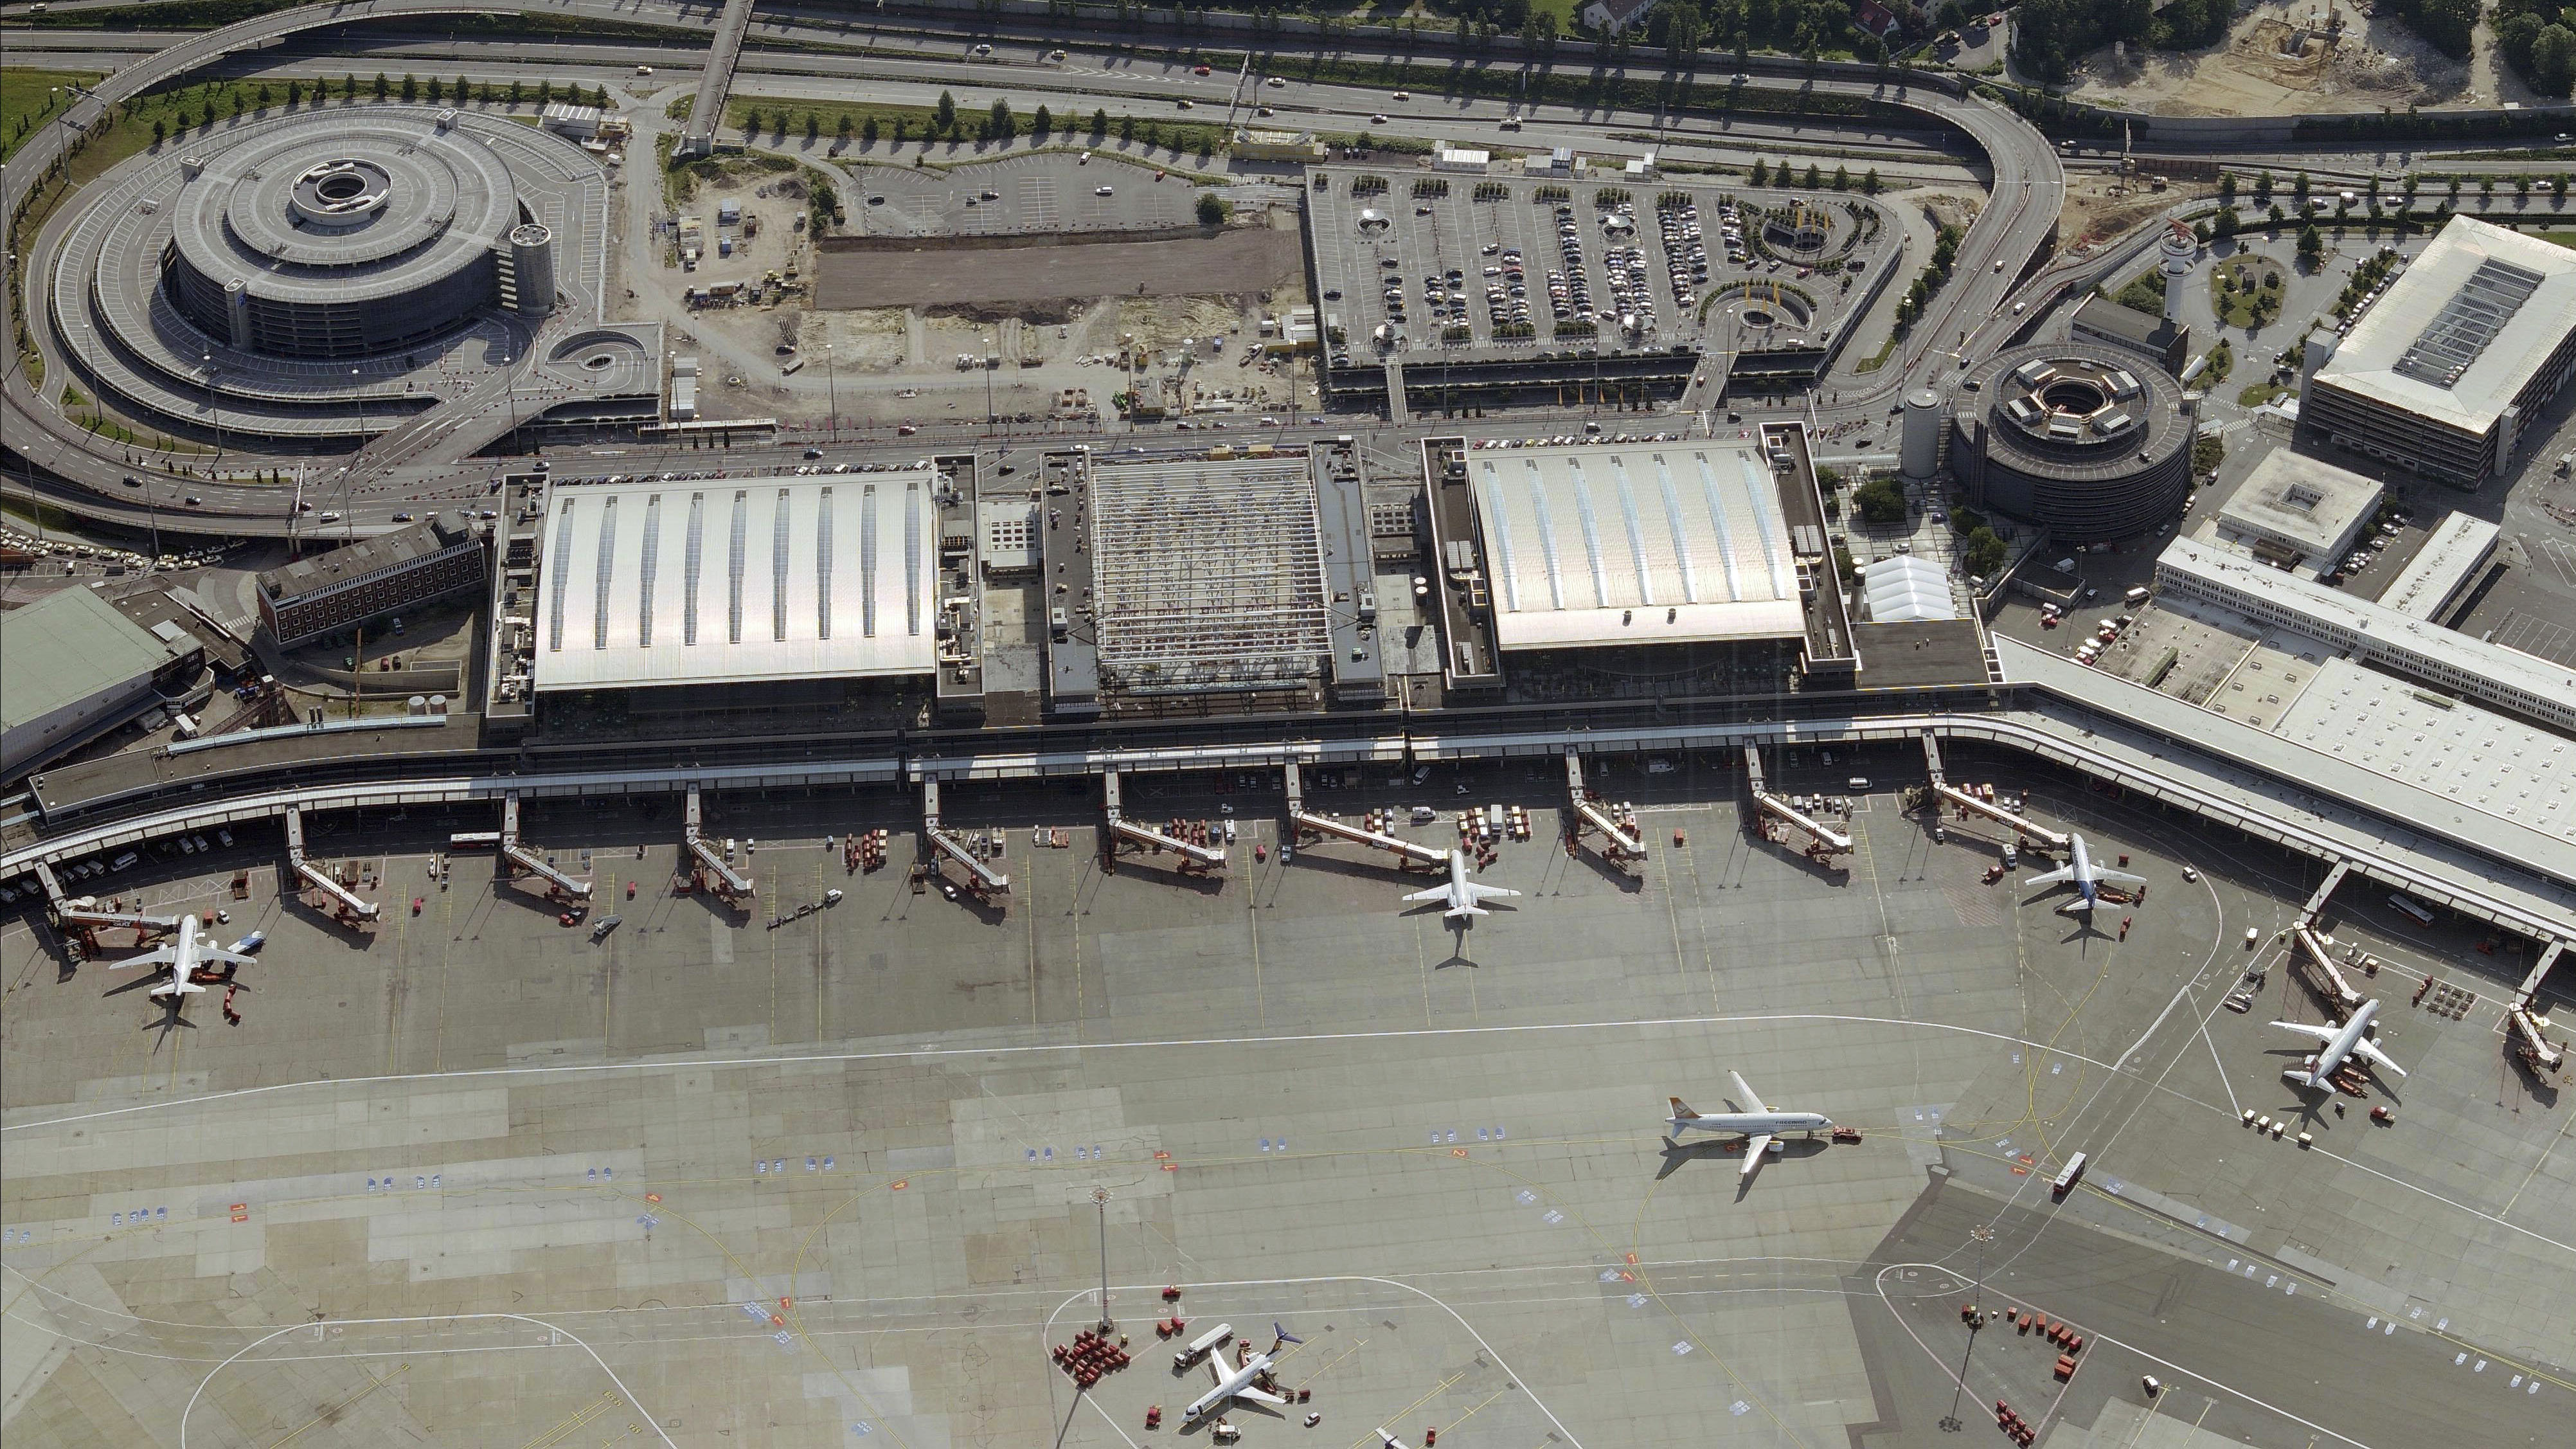 Discovery of World War II bomb temporarily shuts down Hamburg Airport